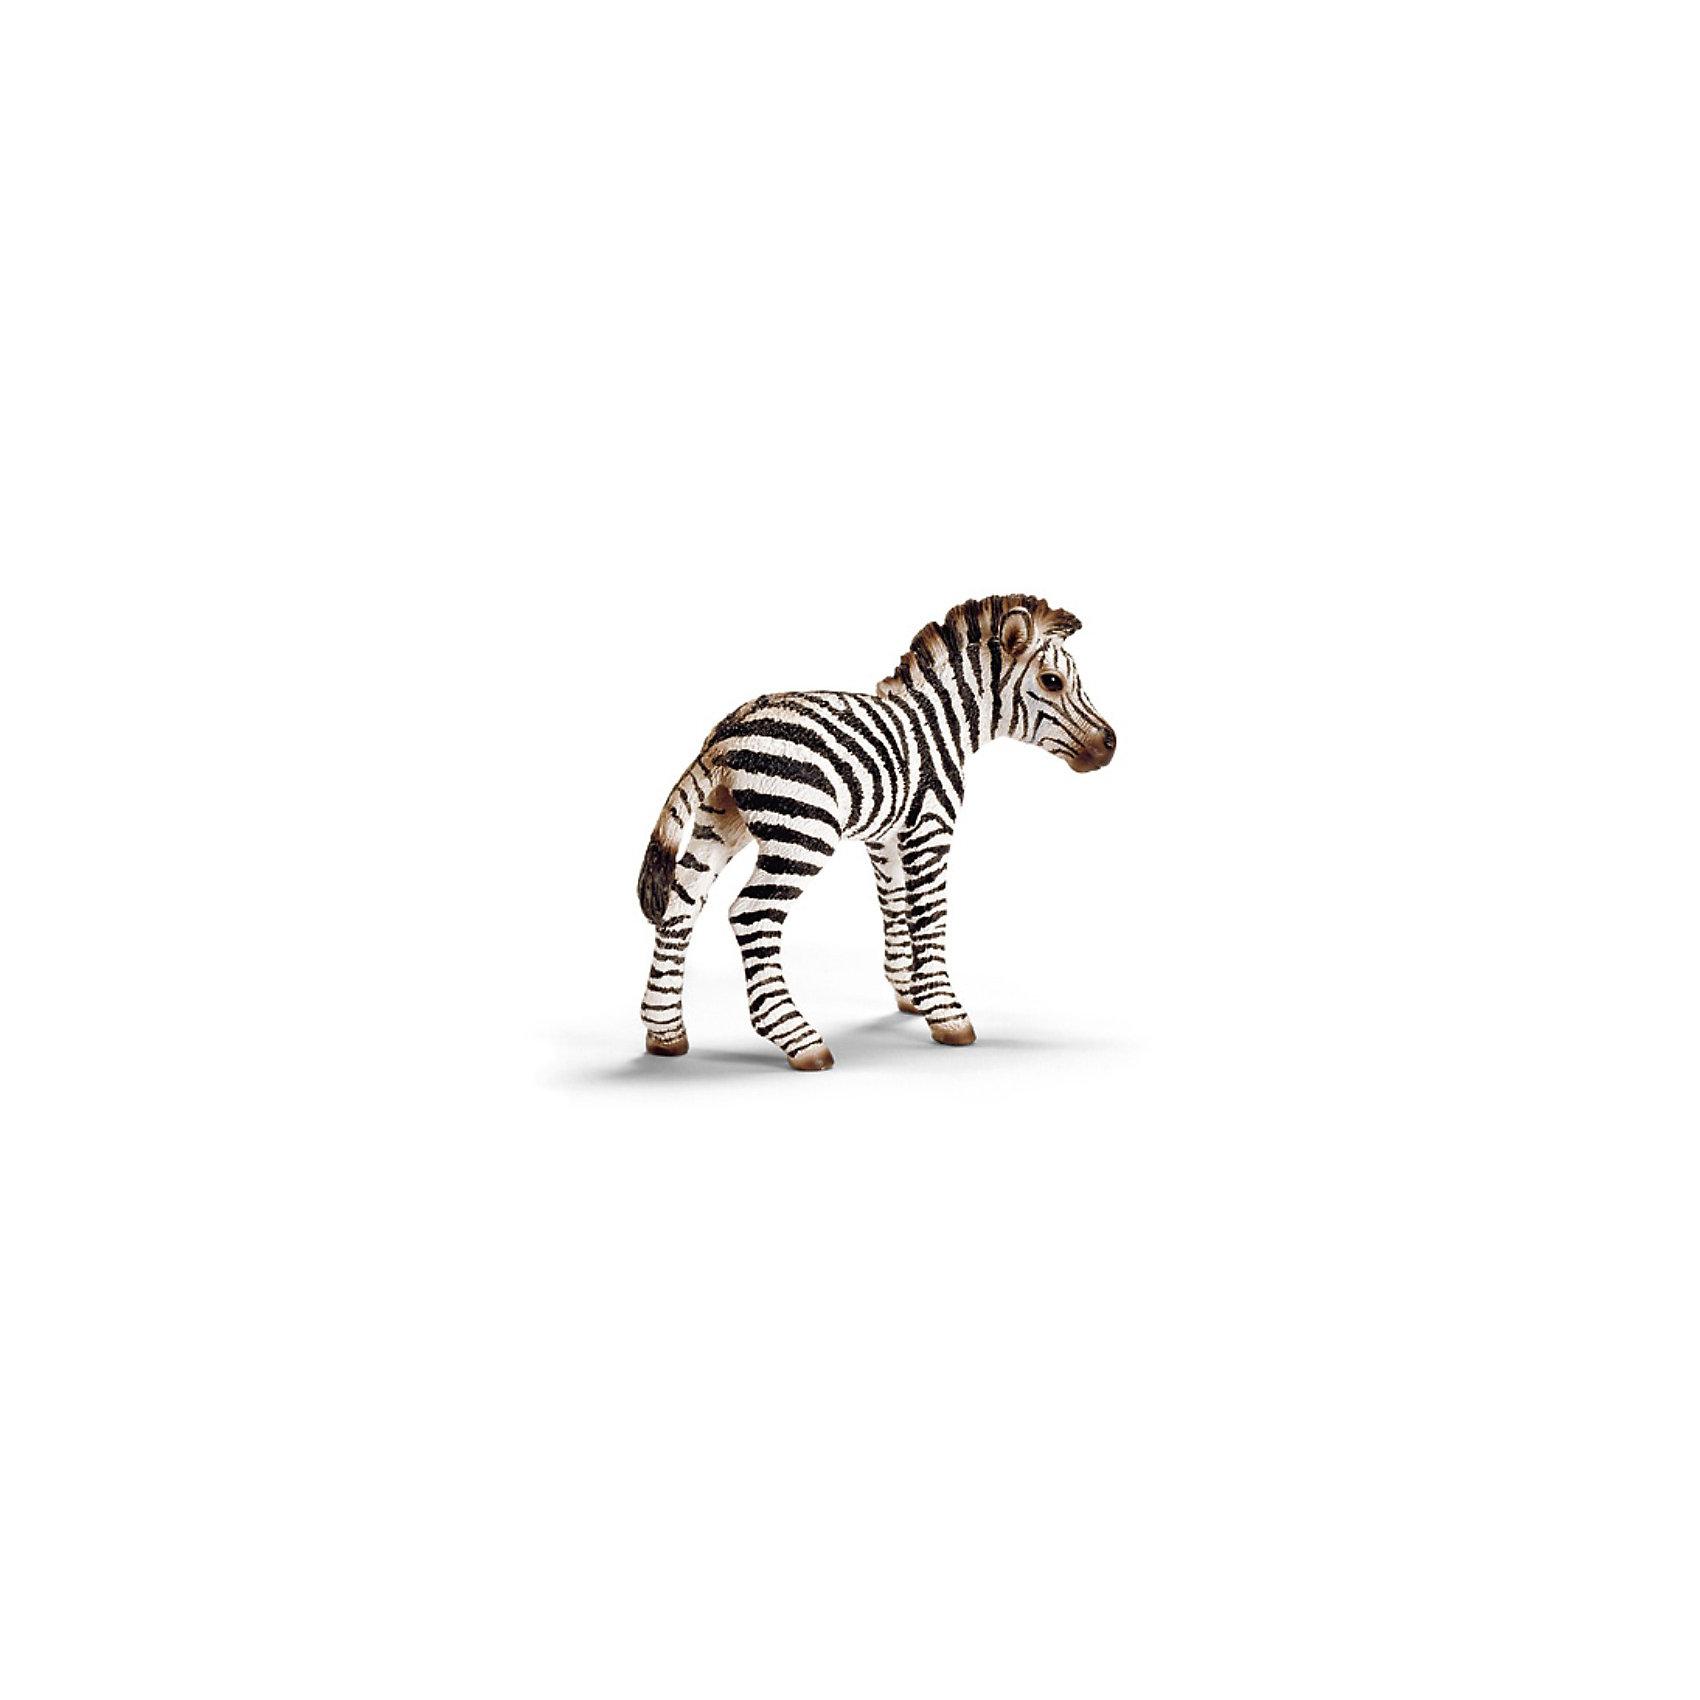 Schleich Schleich Детеныш зебры. Серия Дикие животные животные серия антистресс альбом